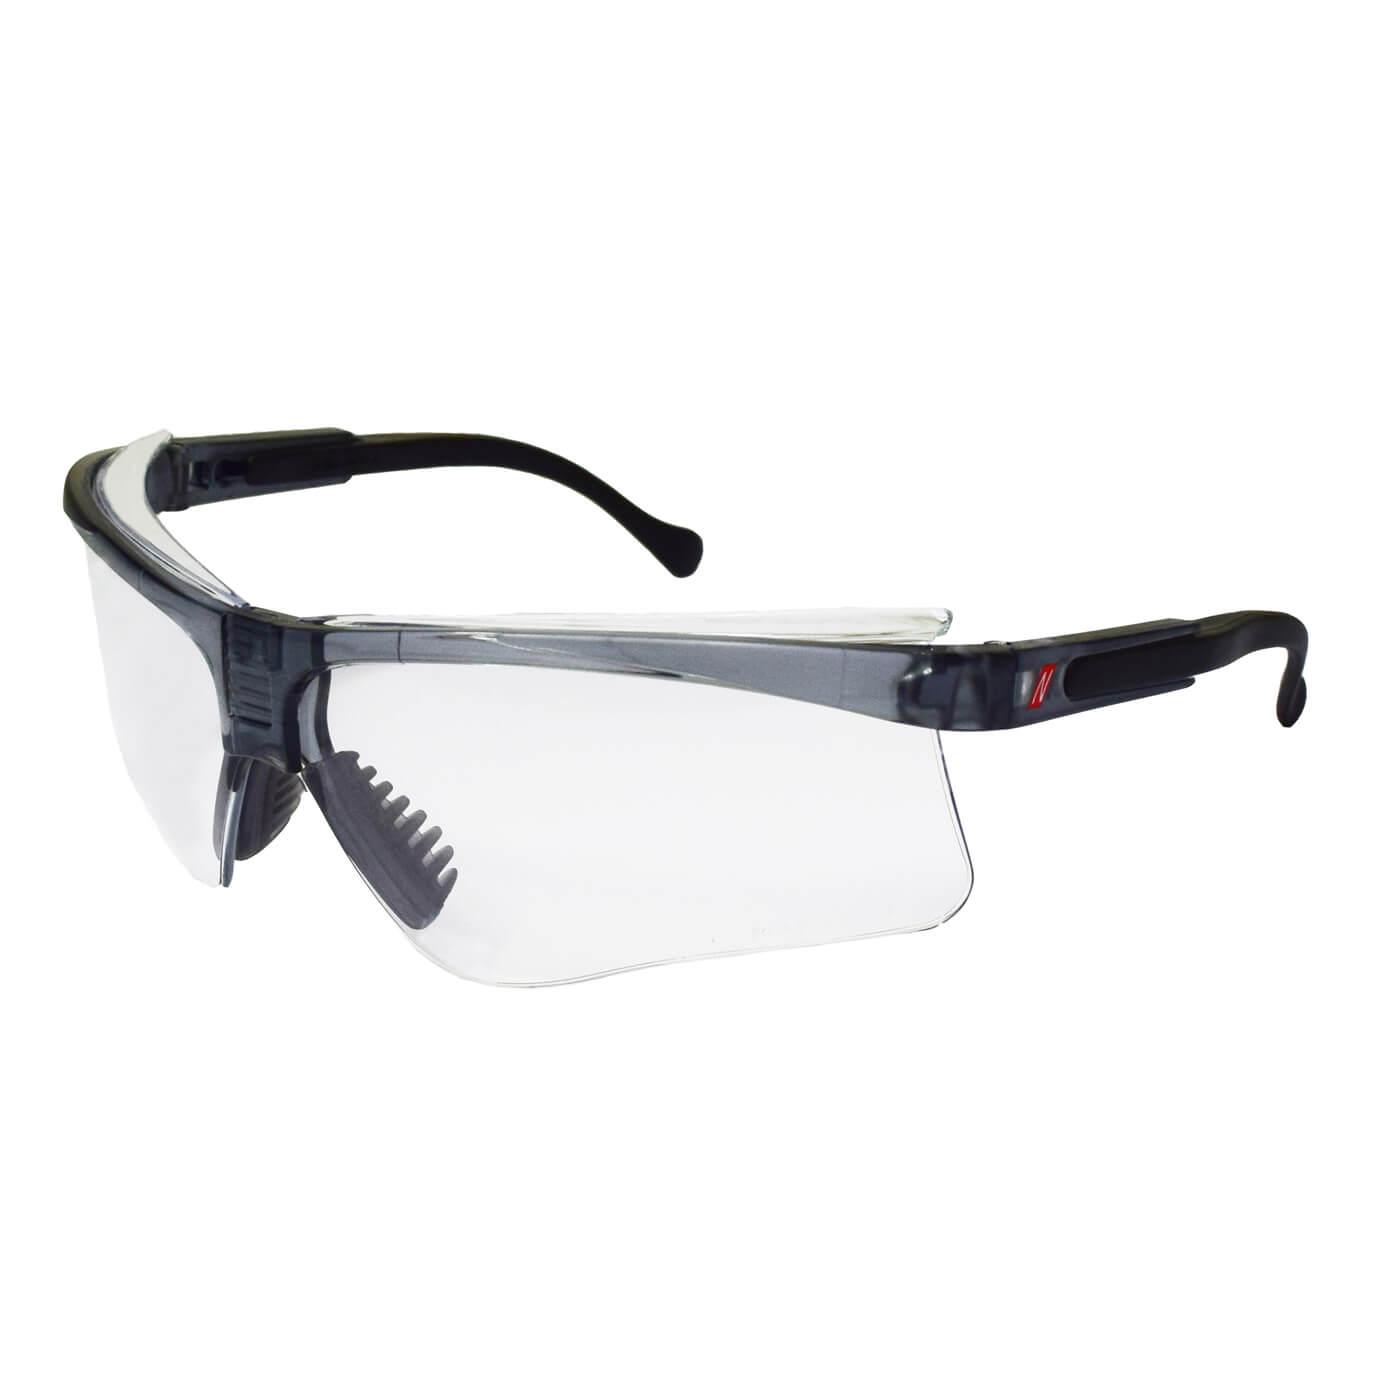 Okulary ochronne Nitras 9020